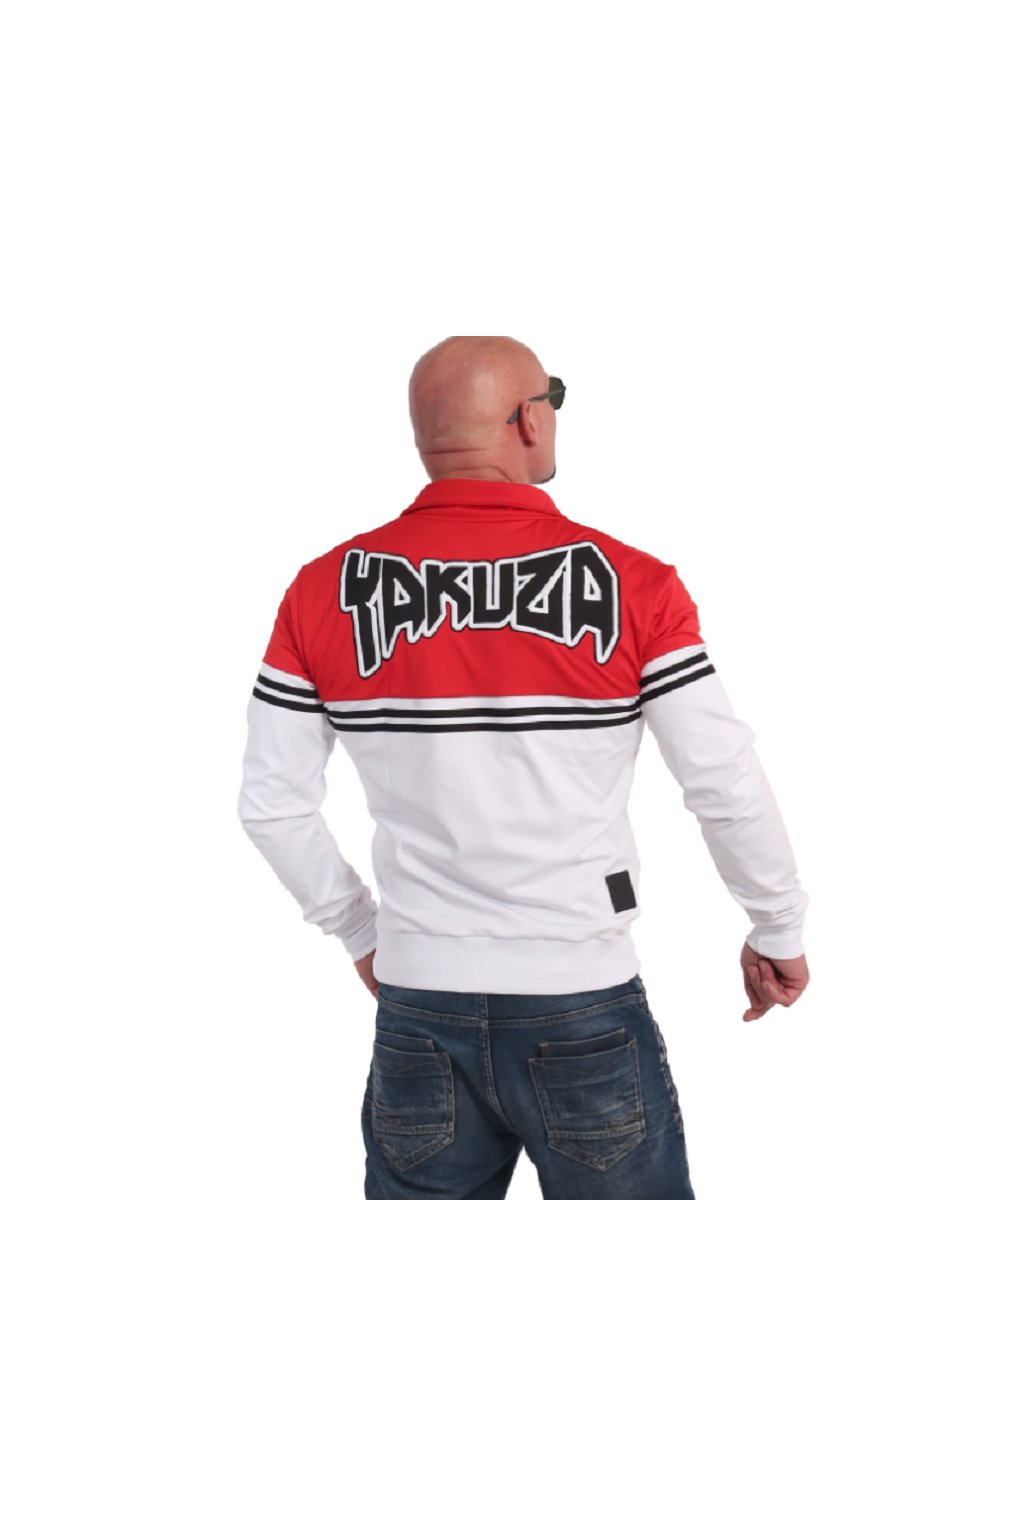 Yakuza mikina se zipem Toxin training Jacke ZB 17016 weiß/rot